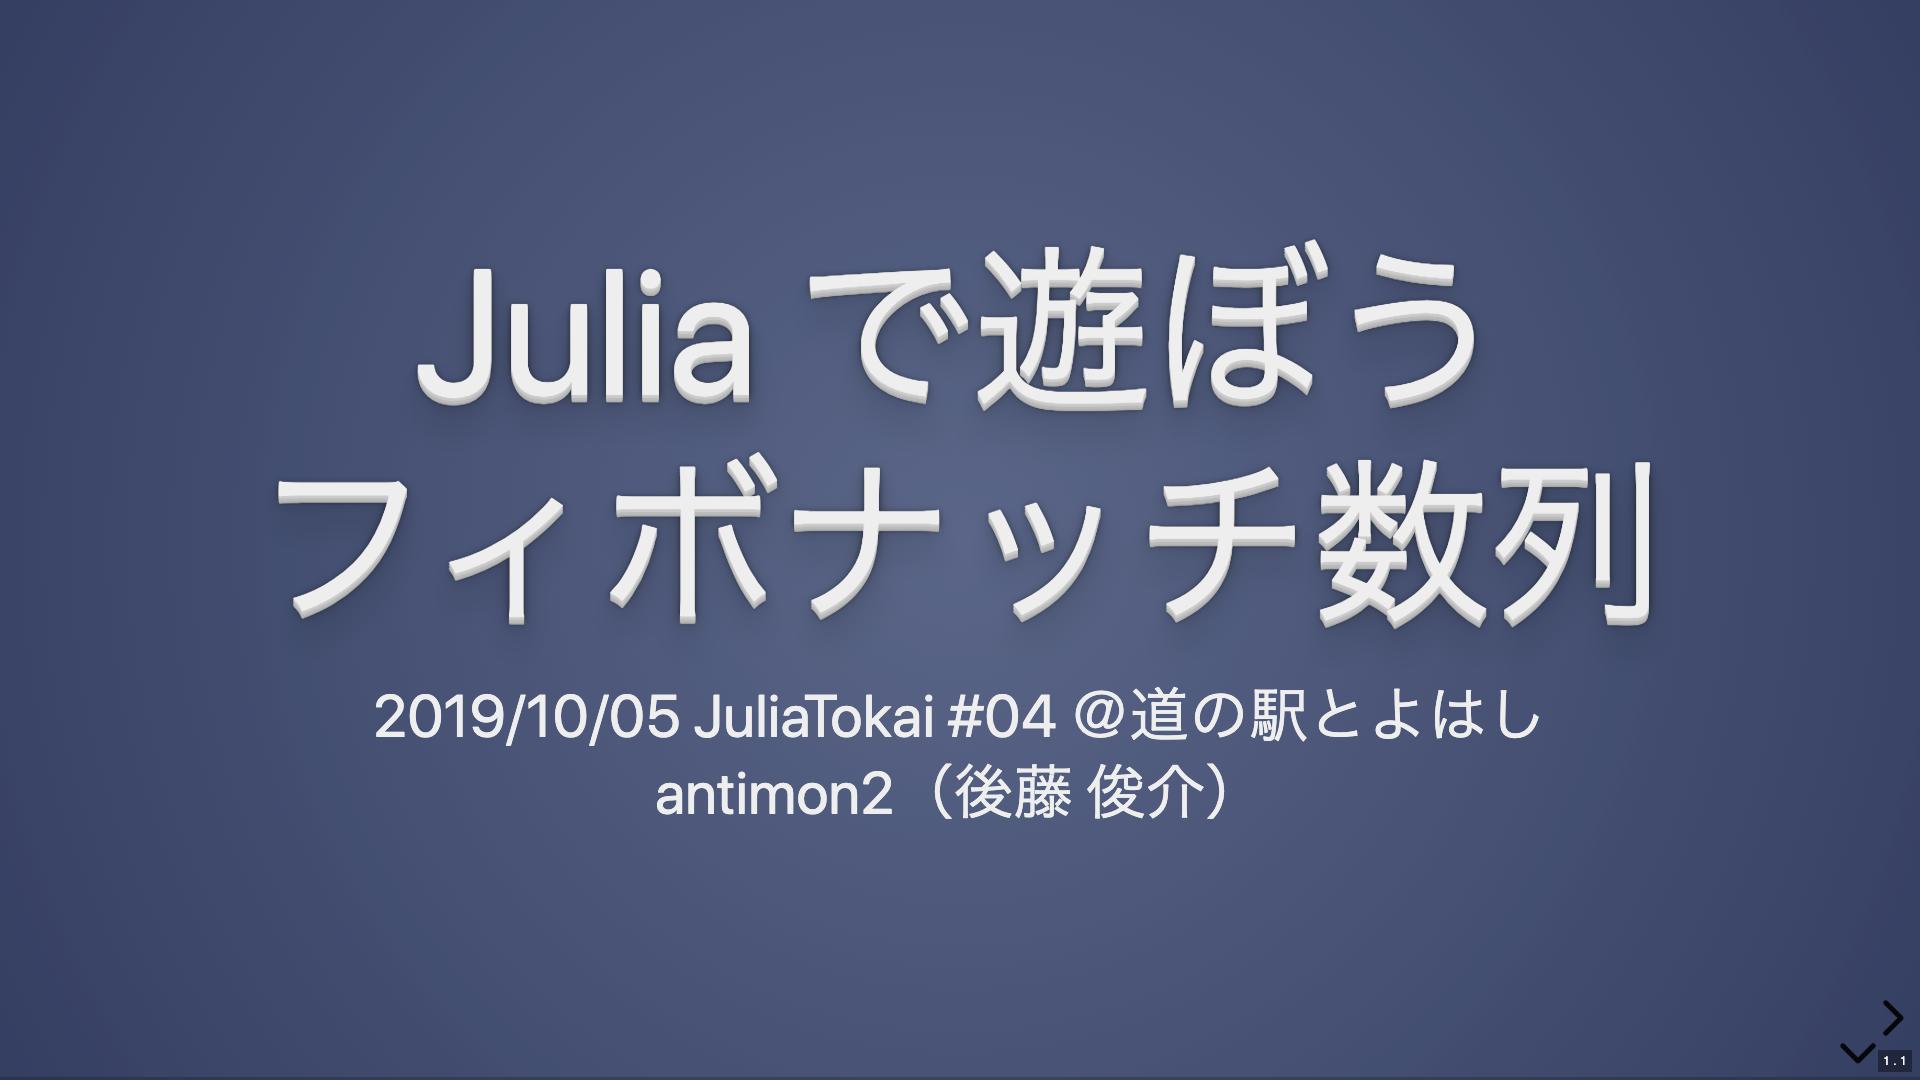 Julia_で遊ぼう_フィボナッチ数列___HackMD.png